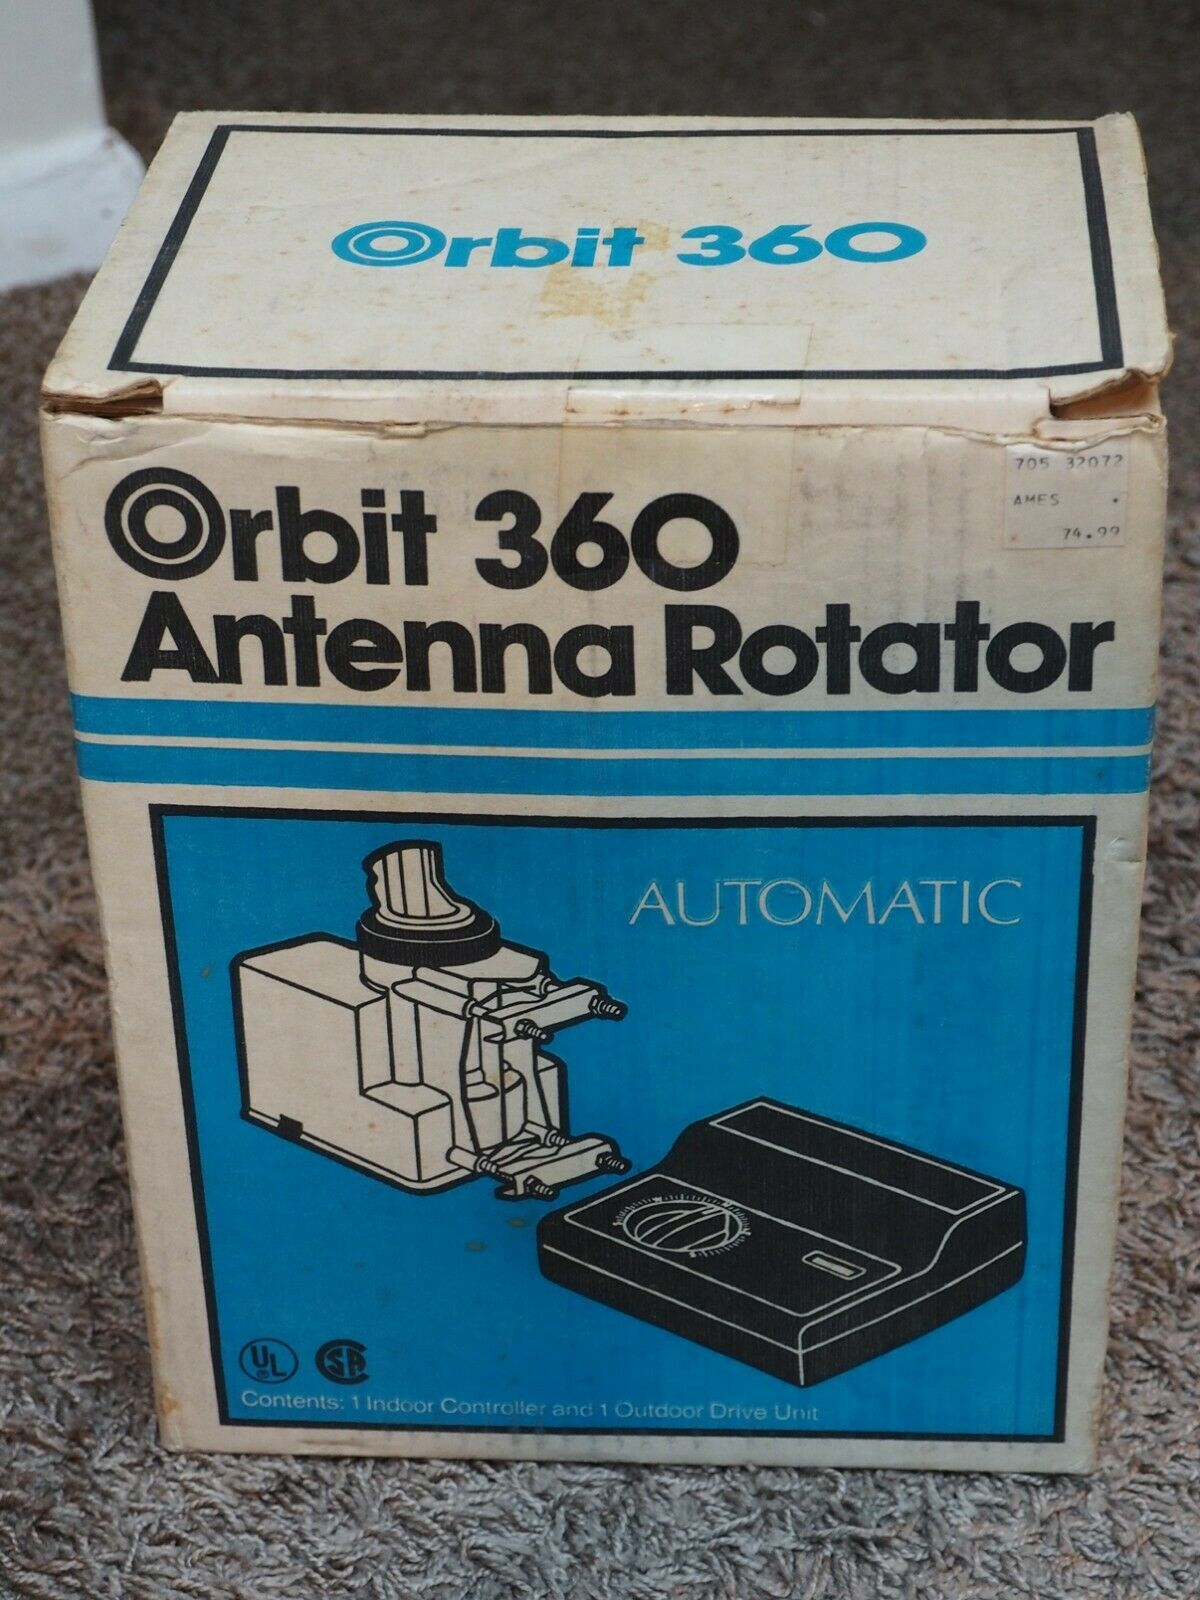 NEW/NIB Gemini ORBIT 360 ANTENNA ROTATOR. Available Now for 125.00